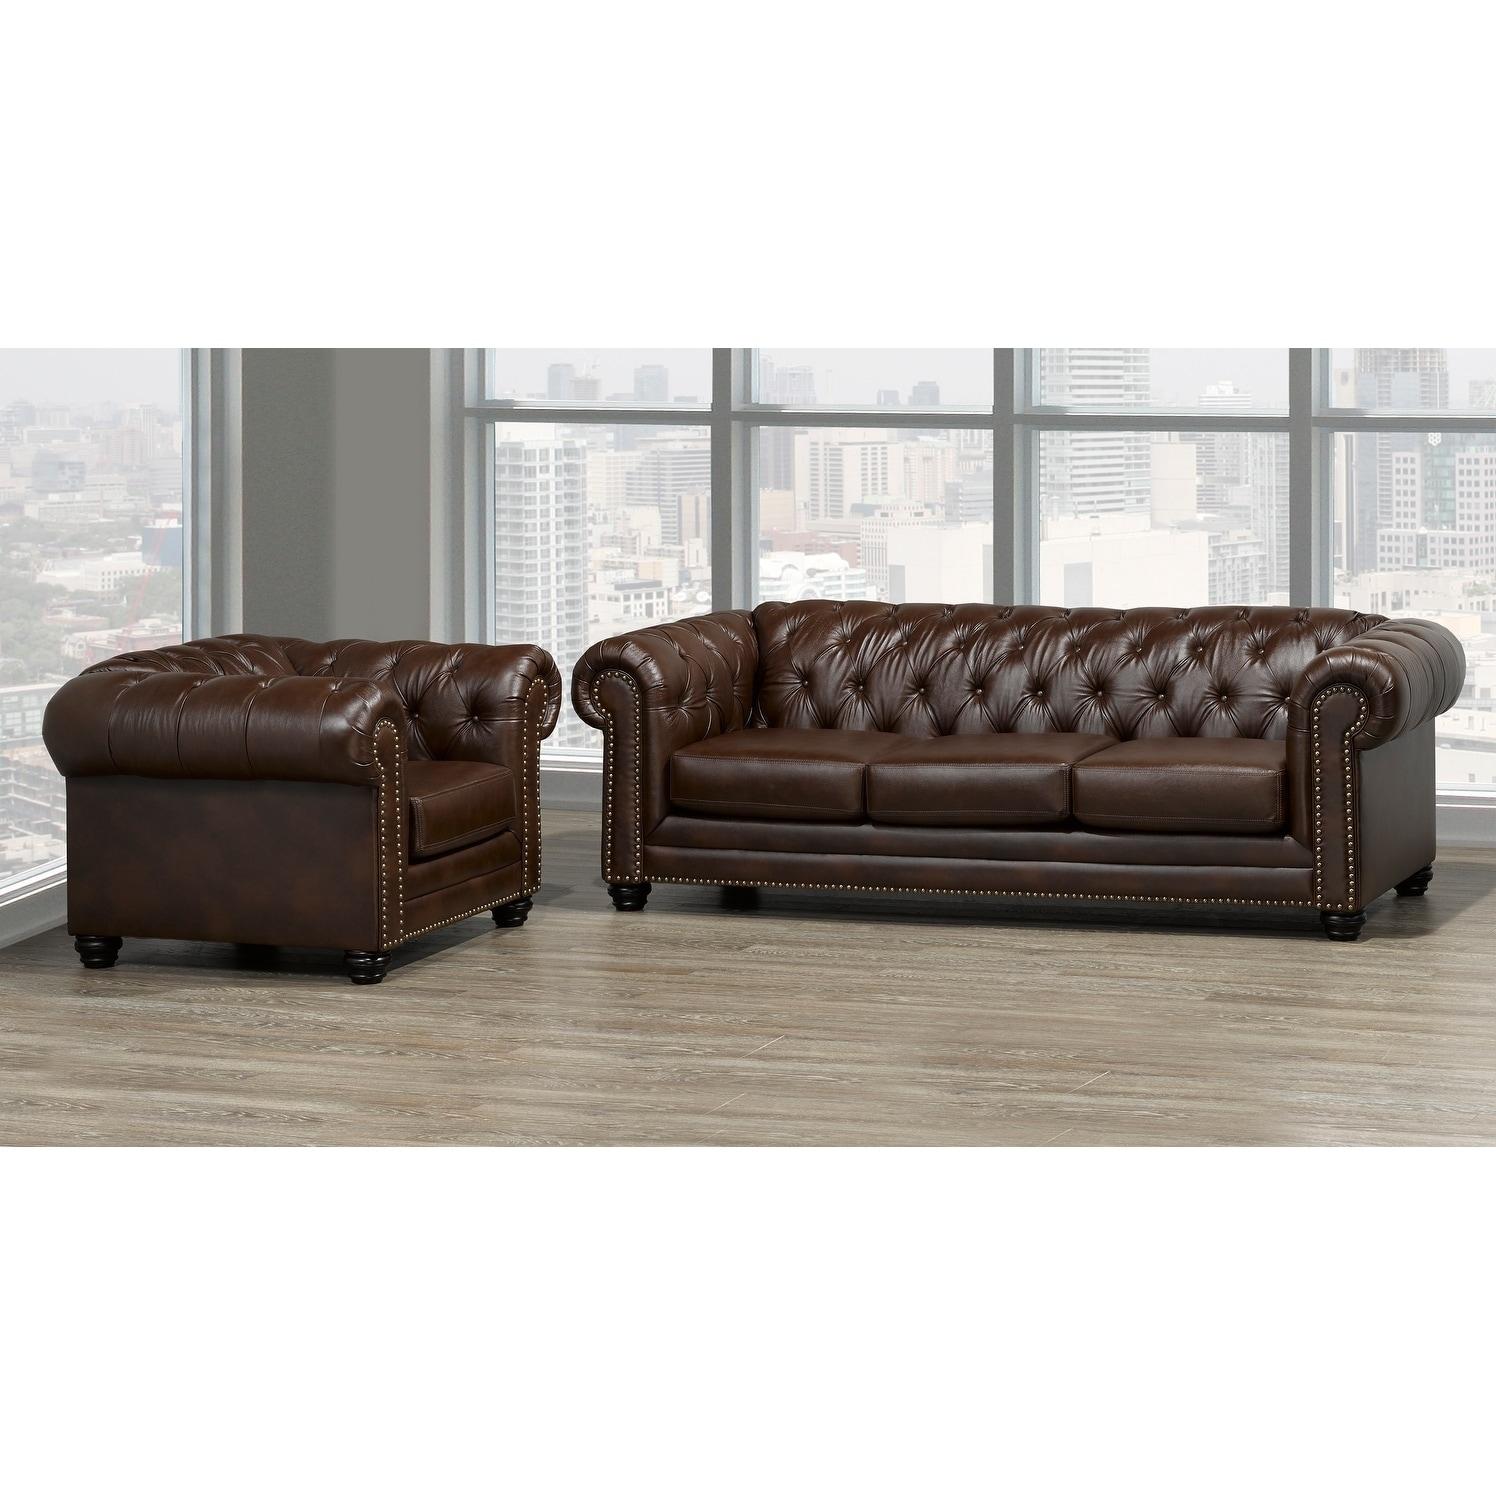 Maryport Top Grain Leather Sofa And Armchair Set